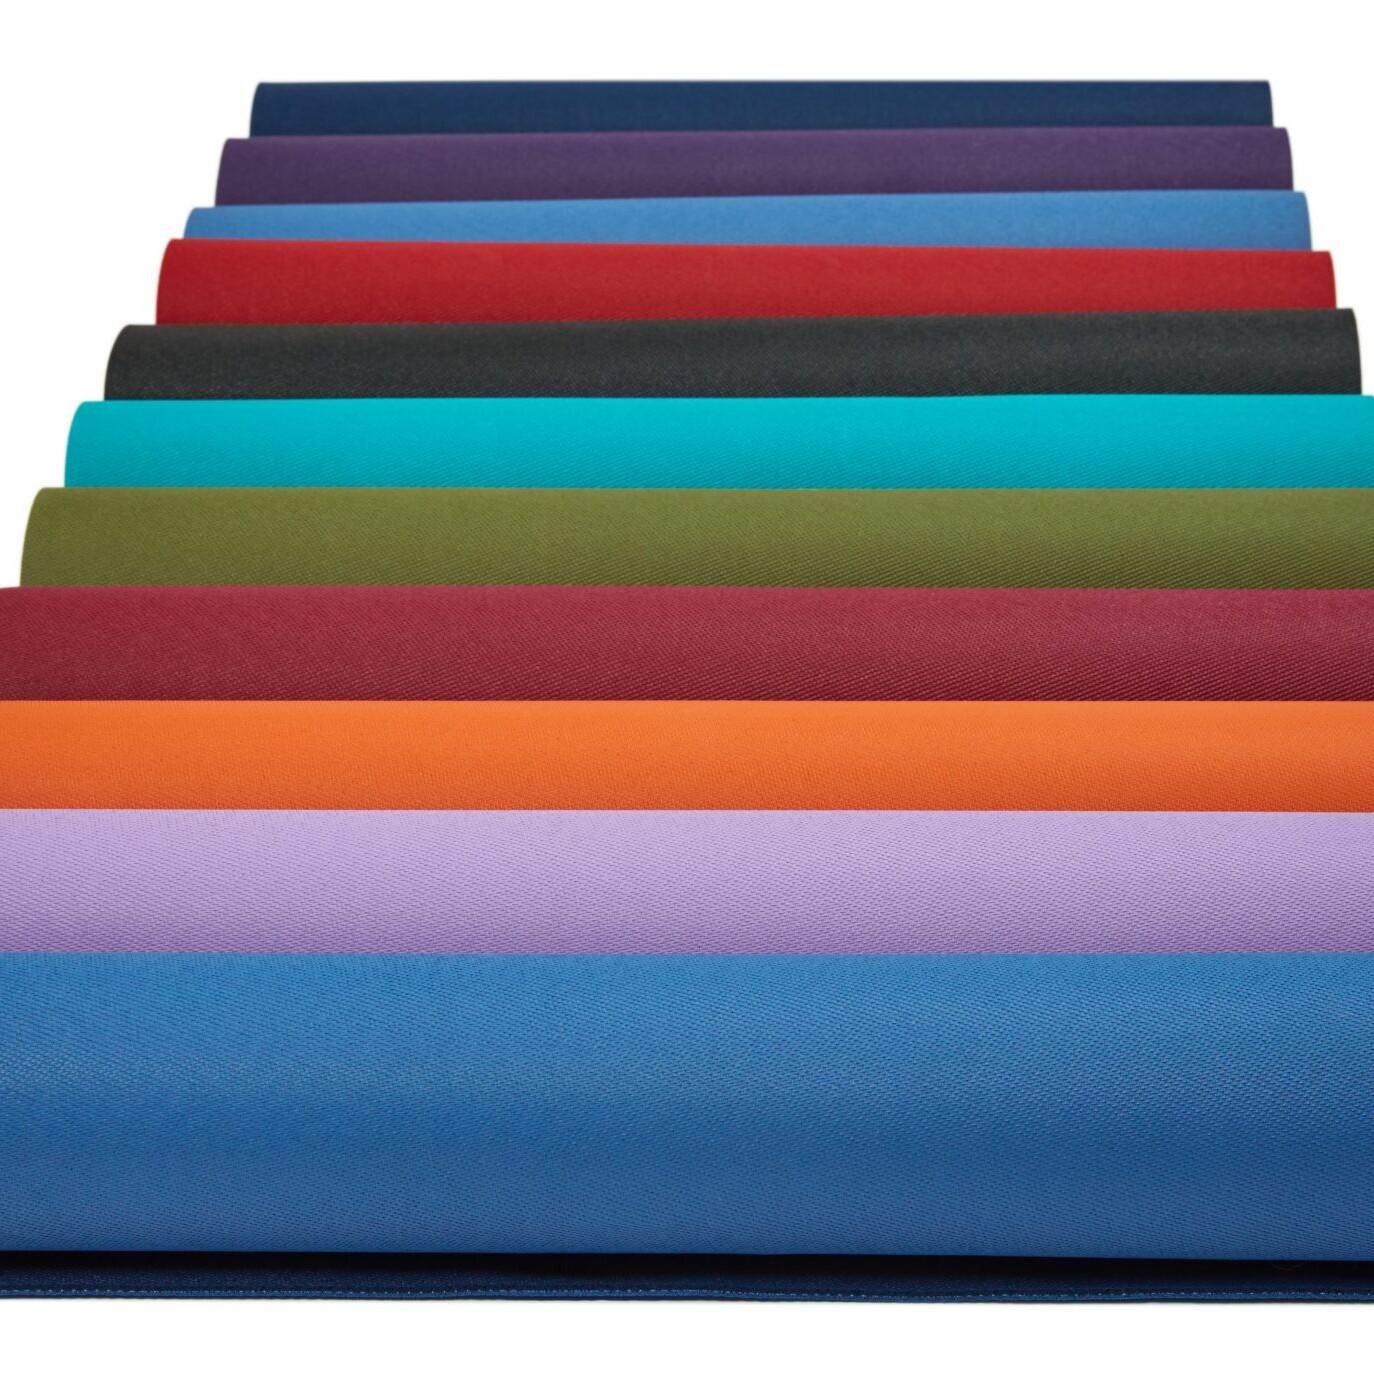 Jade Harmony Saffron Professional Yoga Mat Ouryogashop